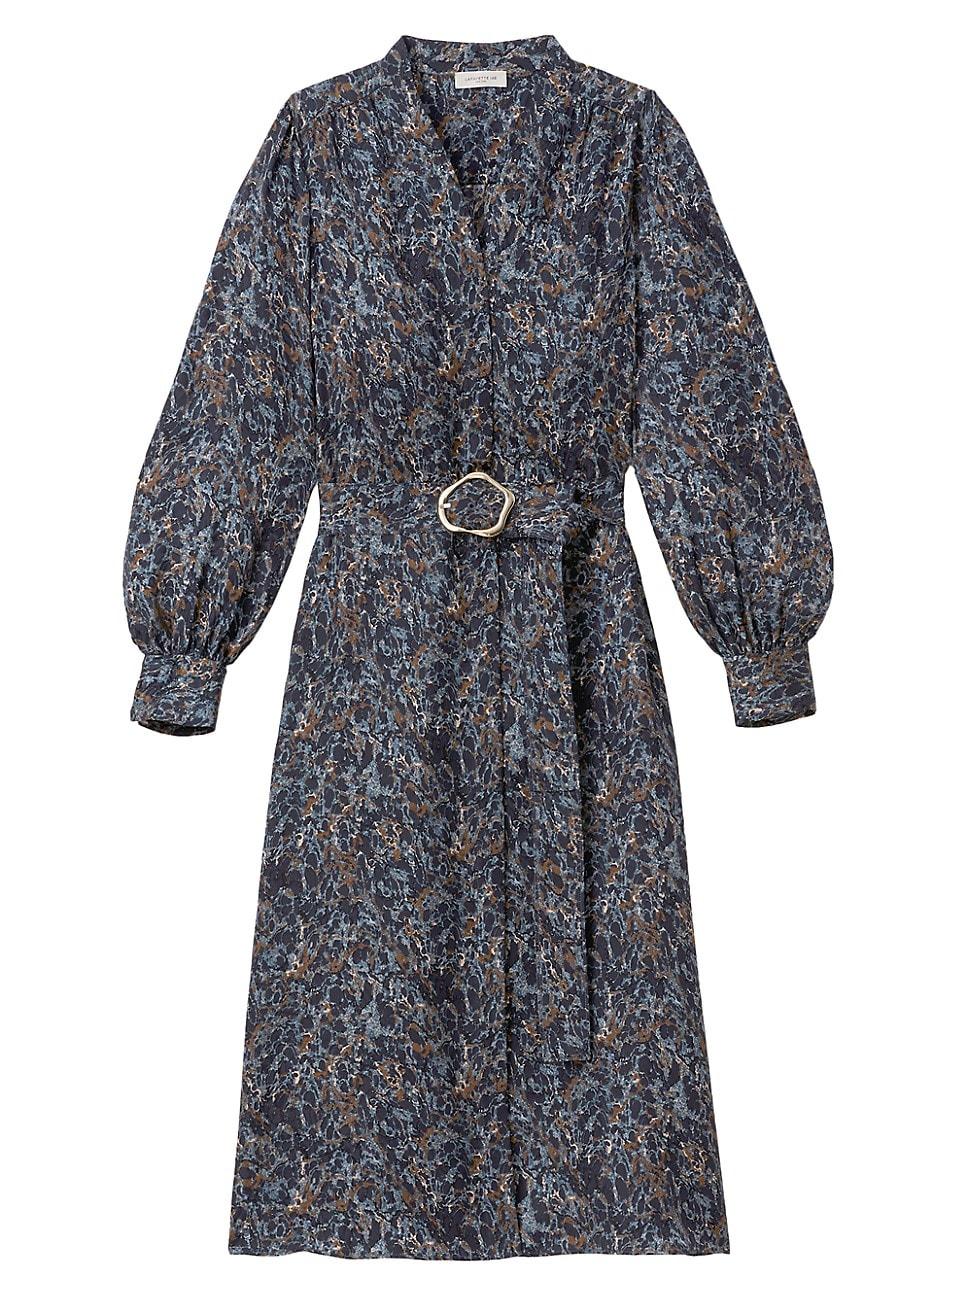 Lafayette 148 WOMEN'S CLEMENTINE MARBLE-PRINT SILK DRESS